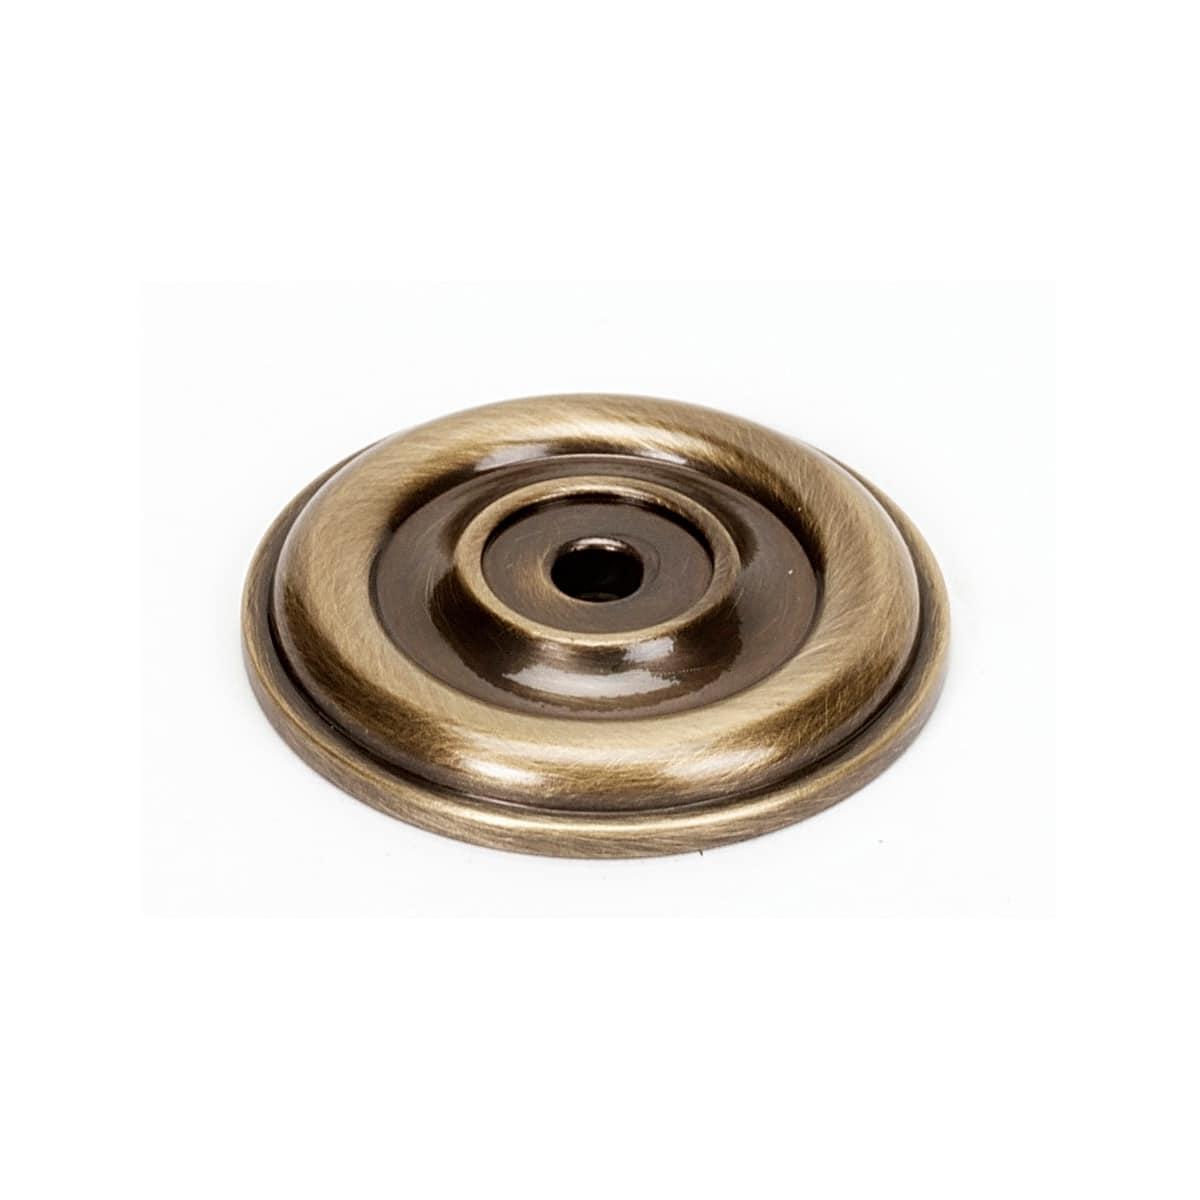 Alno Bella 1-3/8 Inch Diameter Cabinet Knob Backplate